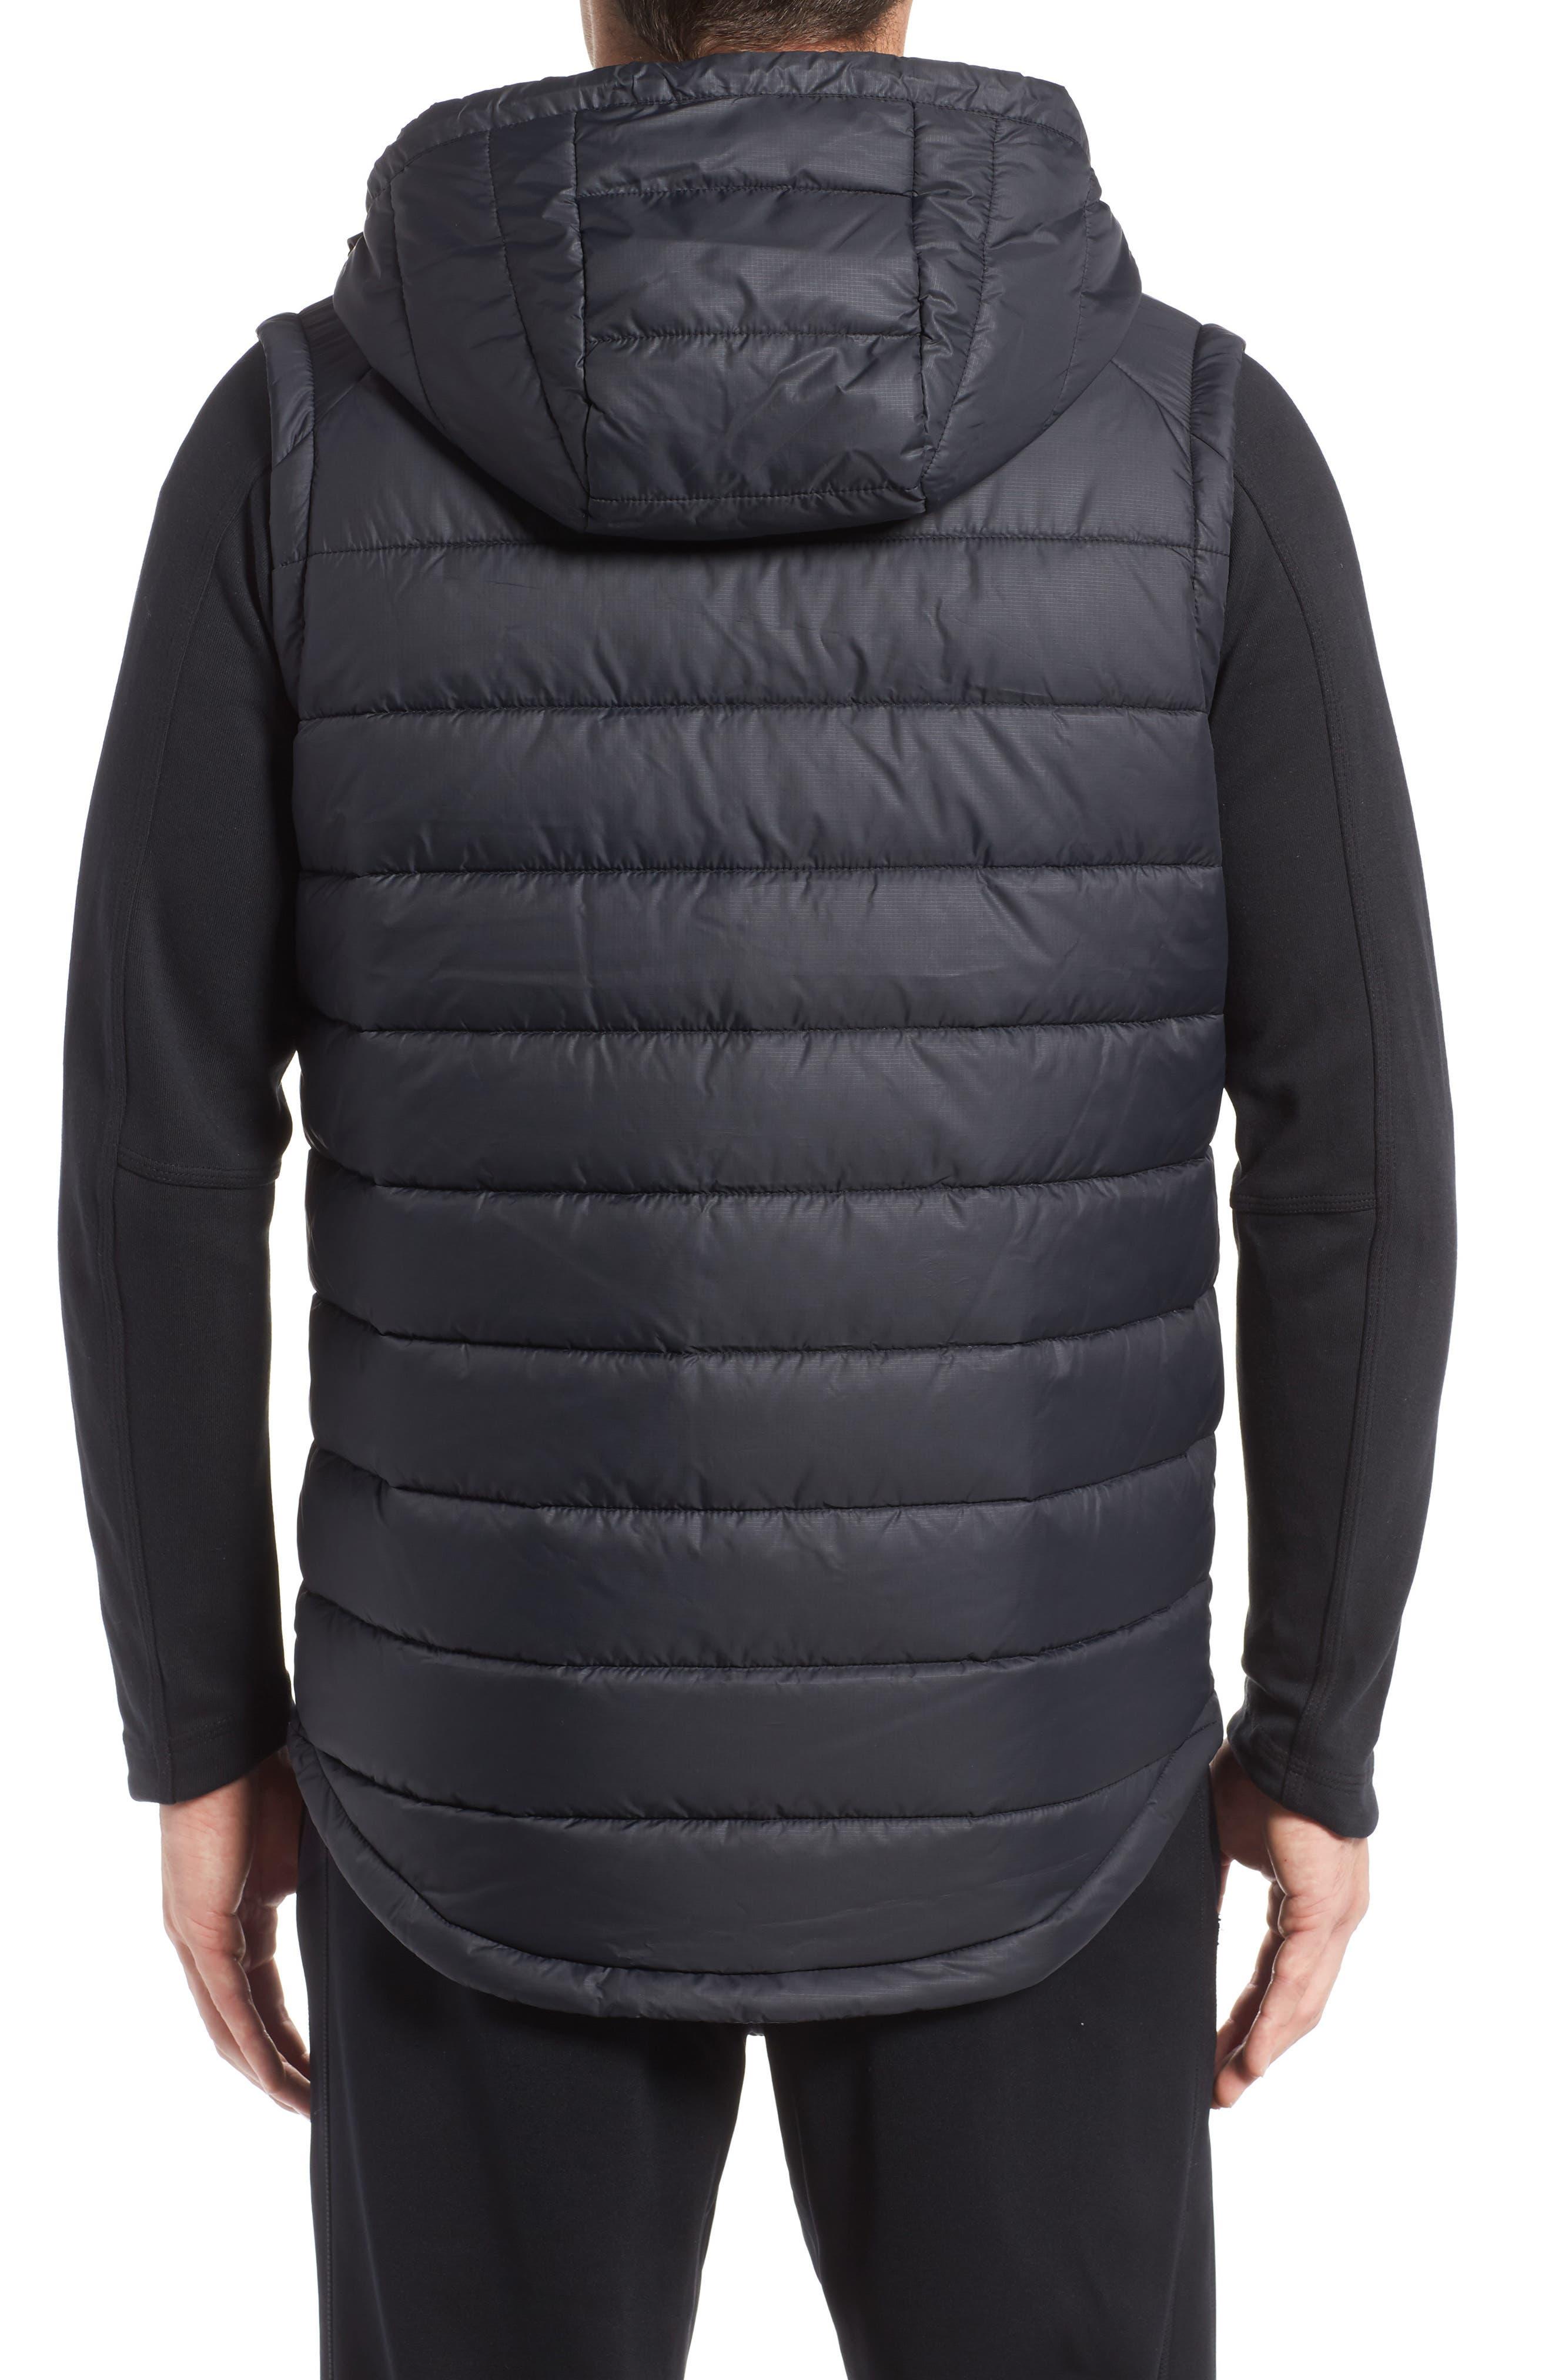 NIKE,                             Sportswear Advance 15 Jacket,                             Alternate thumbnail 2, color,                             010